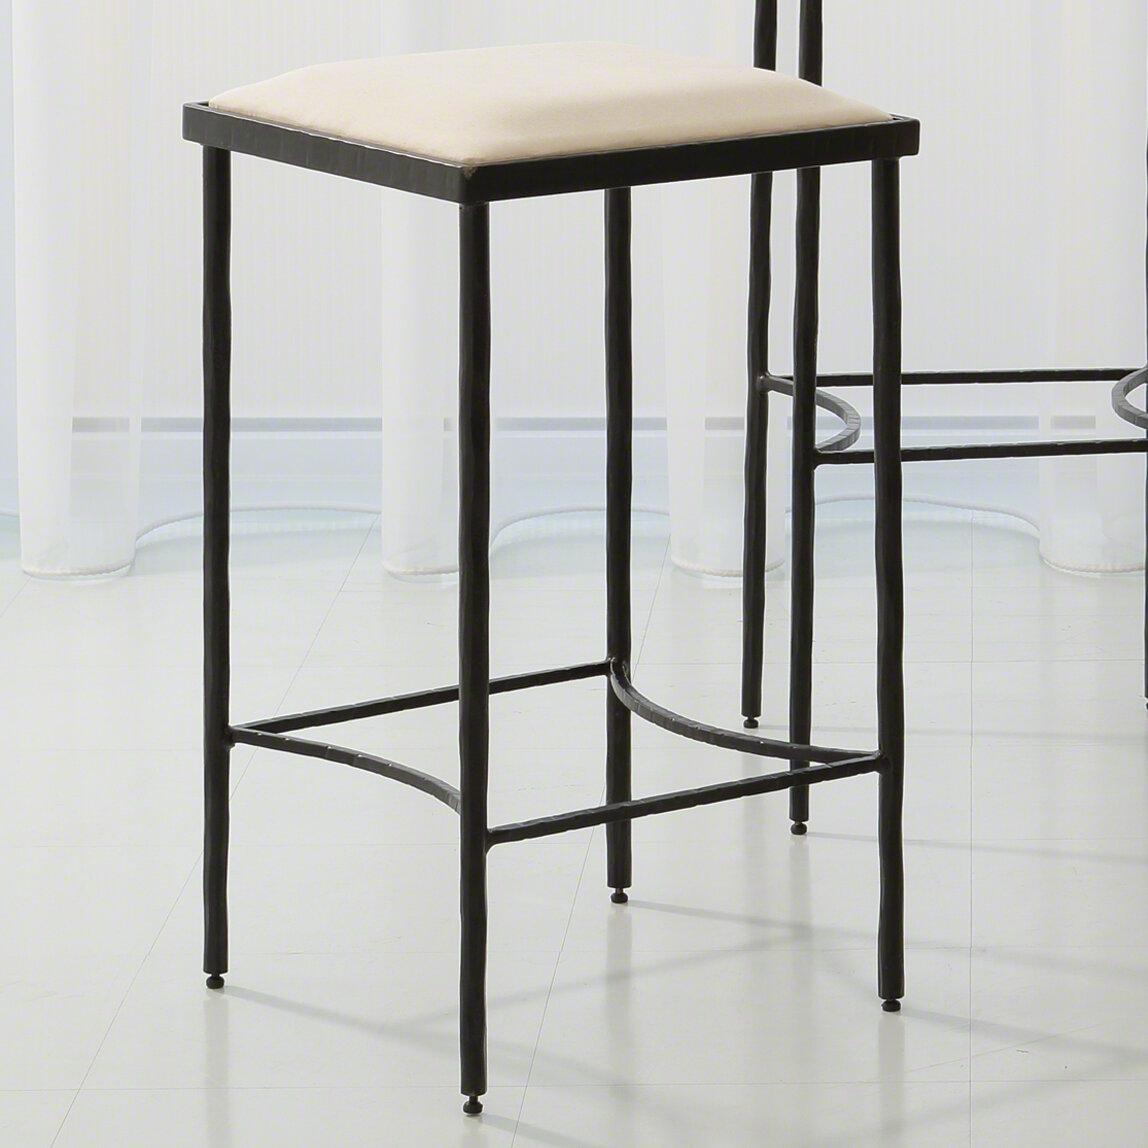 Stupendous Hammered 25 Bar Stool Unemploymentrelief Wooden Chair Designs For Living Room Unemploymentrelieforg